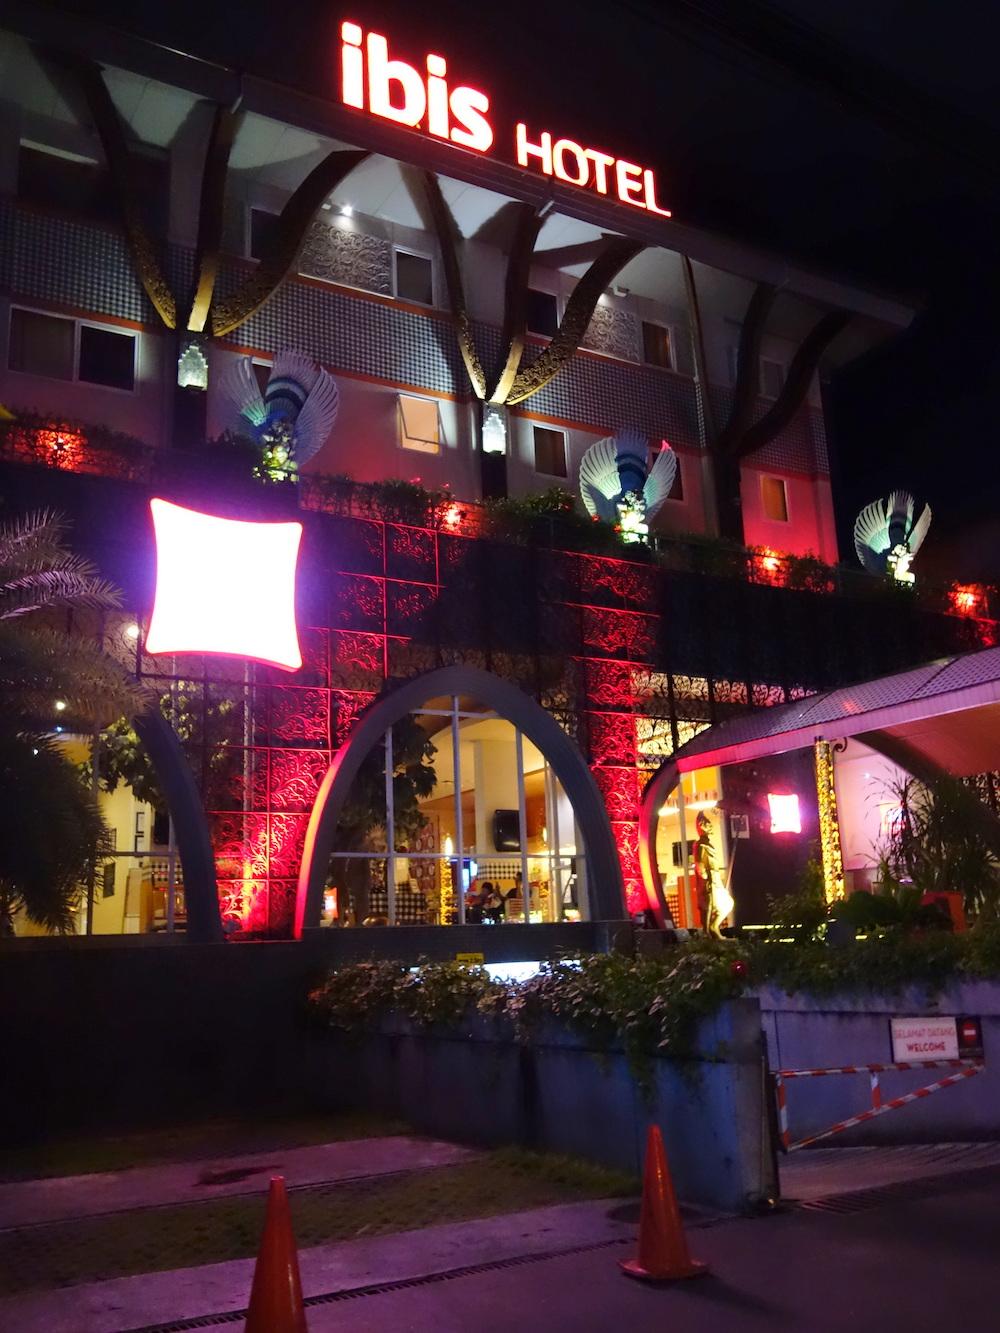 tesyasblog : Ibis Bali Kuta: Budget Hotel Near Bali's Airport